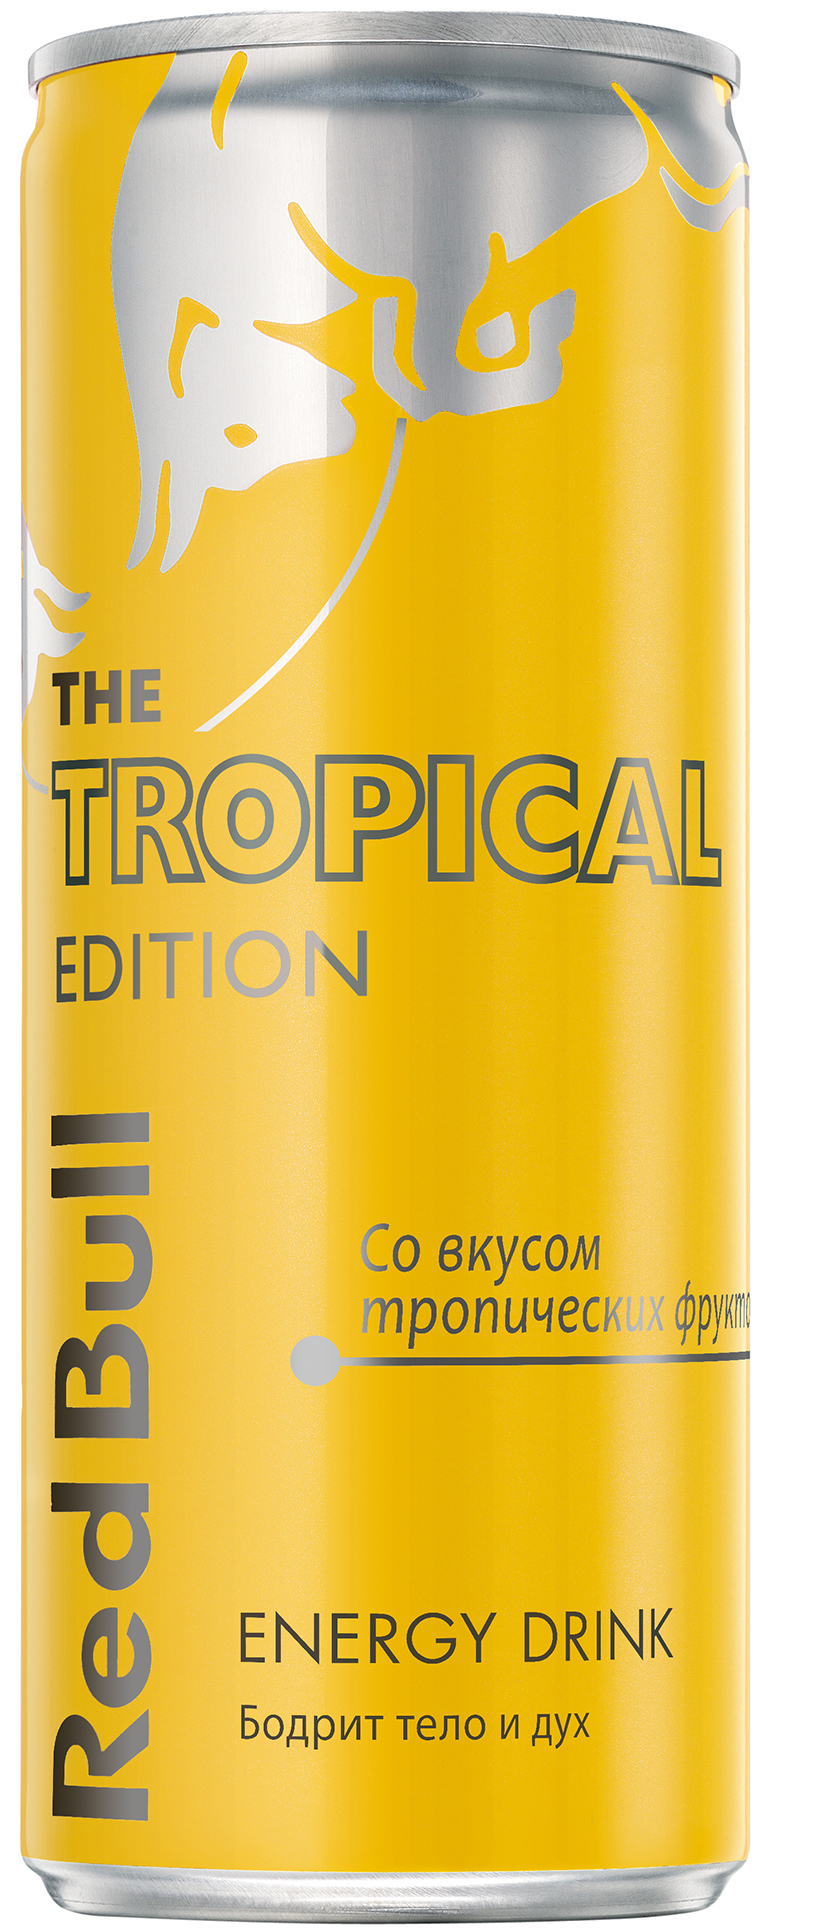 Напиток энергетический Red Bull. The Tropical Edition (вкус тропических фруктов) (250 мл.)